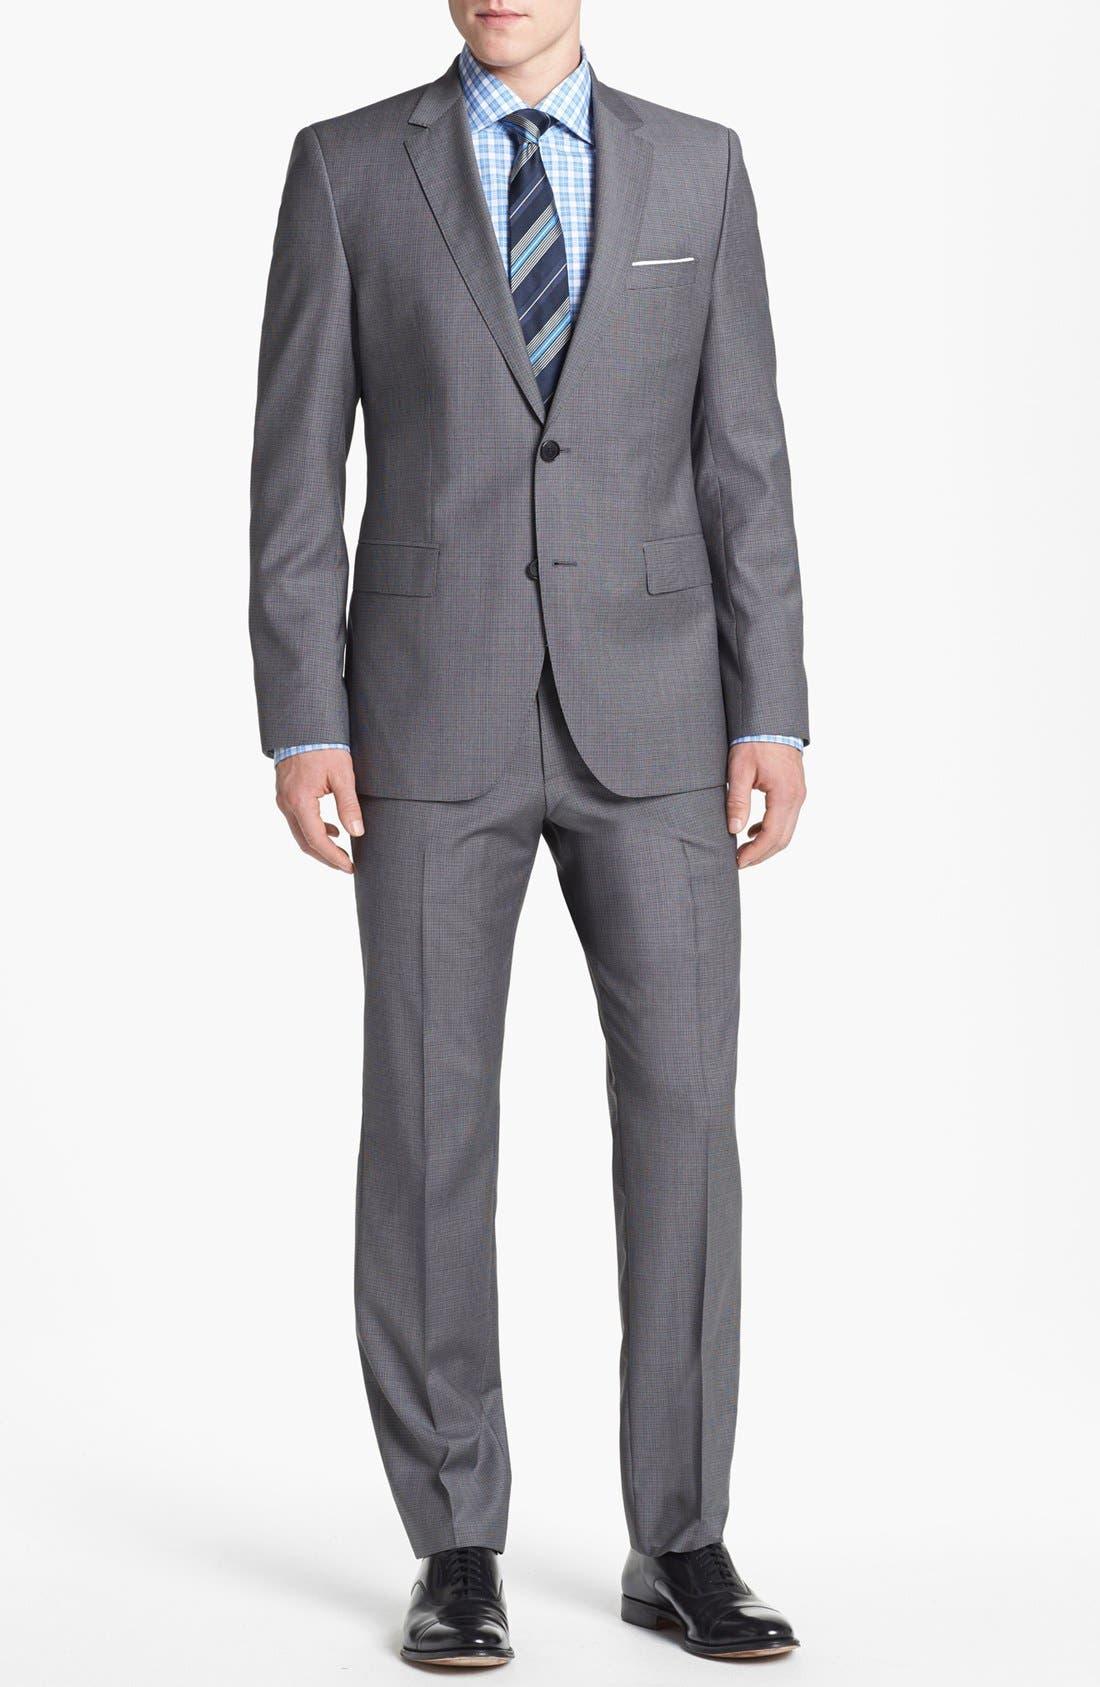 Main Image - BOSS HUGO BOSS 'James/Sharp' Trim Fit Houndstooth Suit